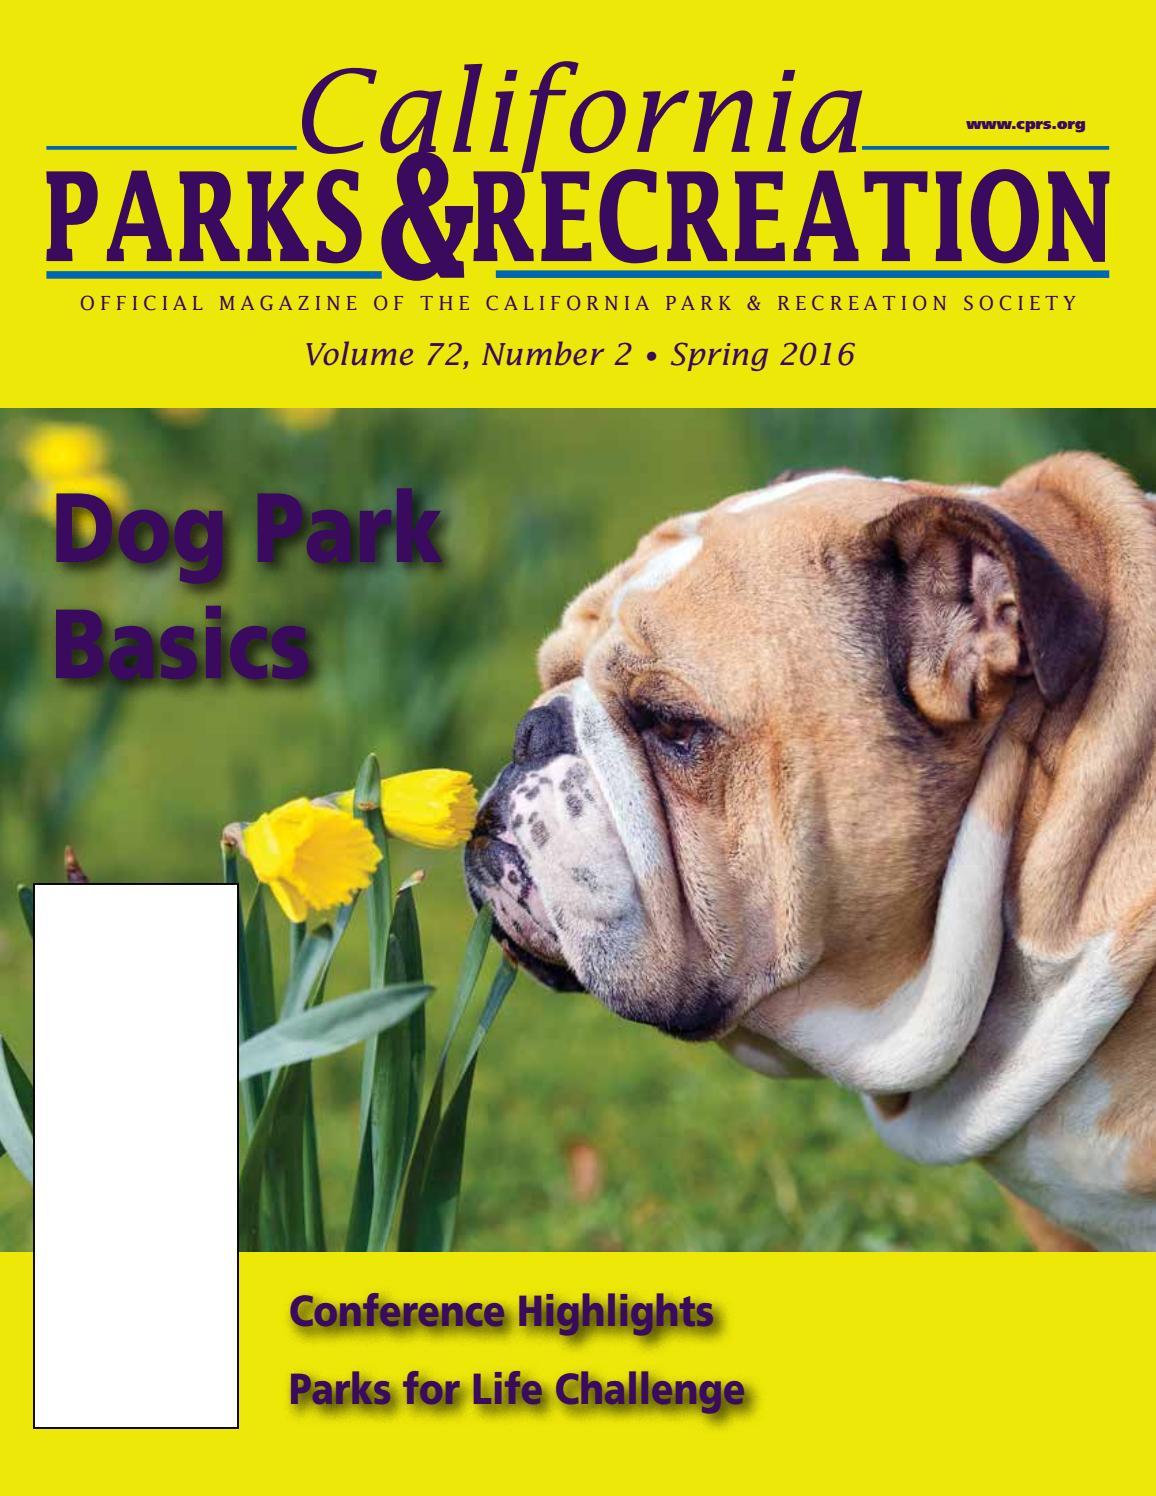 California Parks Recreation Magazine Spring 2016 Vol 72 No 2 By John Glaeser Issuu